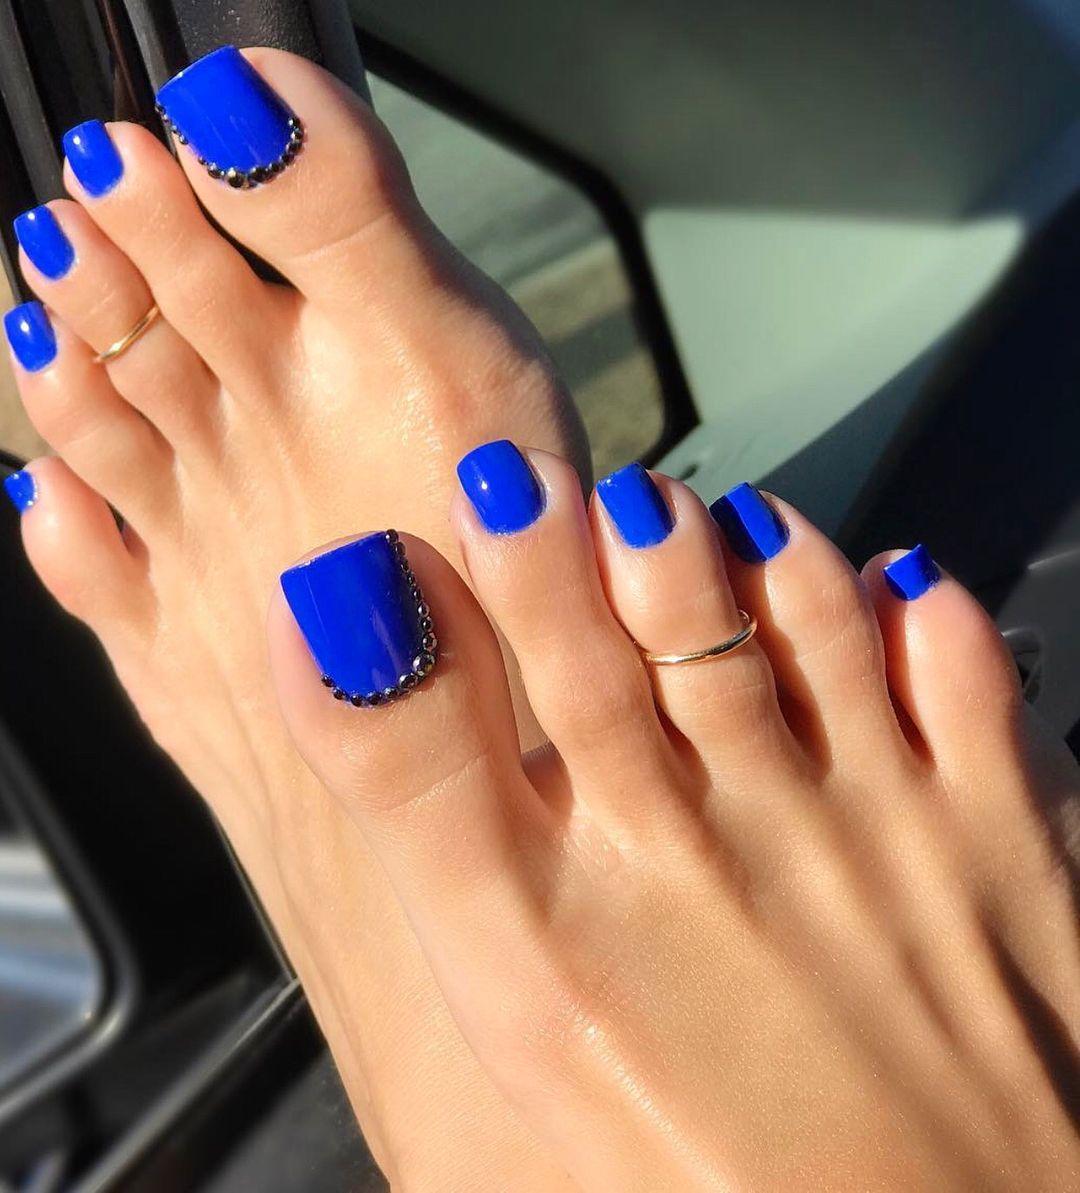 Swipe Flashbackfriday That Deep Royal Blue Lolatoenailz Brazilianbarbie Feet Footfetishgroup Footfetishnation Blue Toe Nails Toe Nails Royal Blue Nails